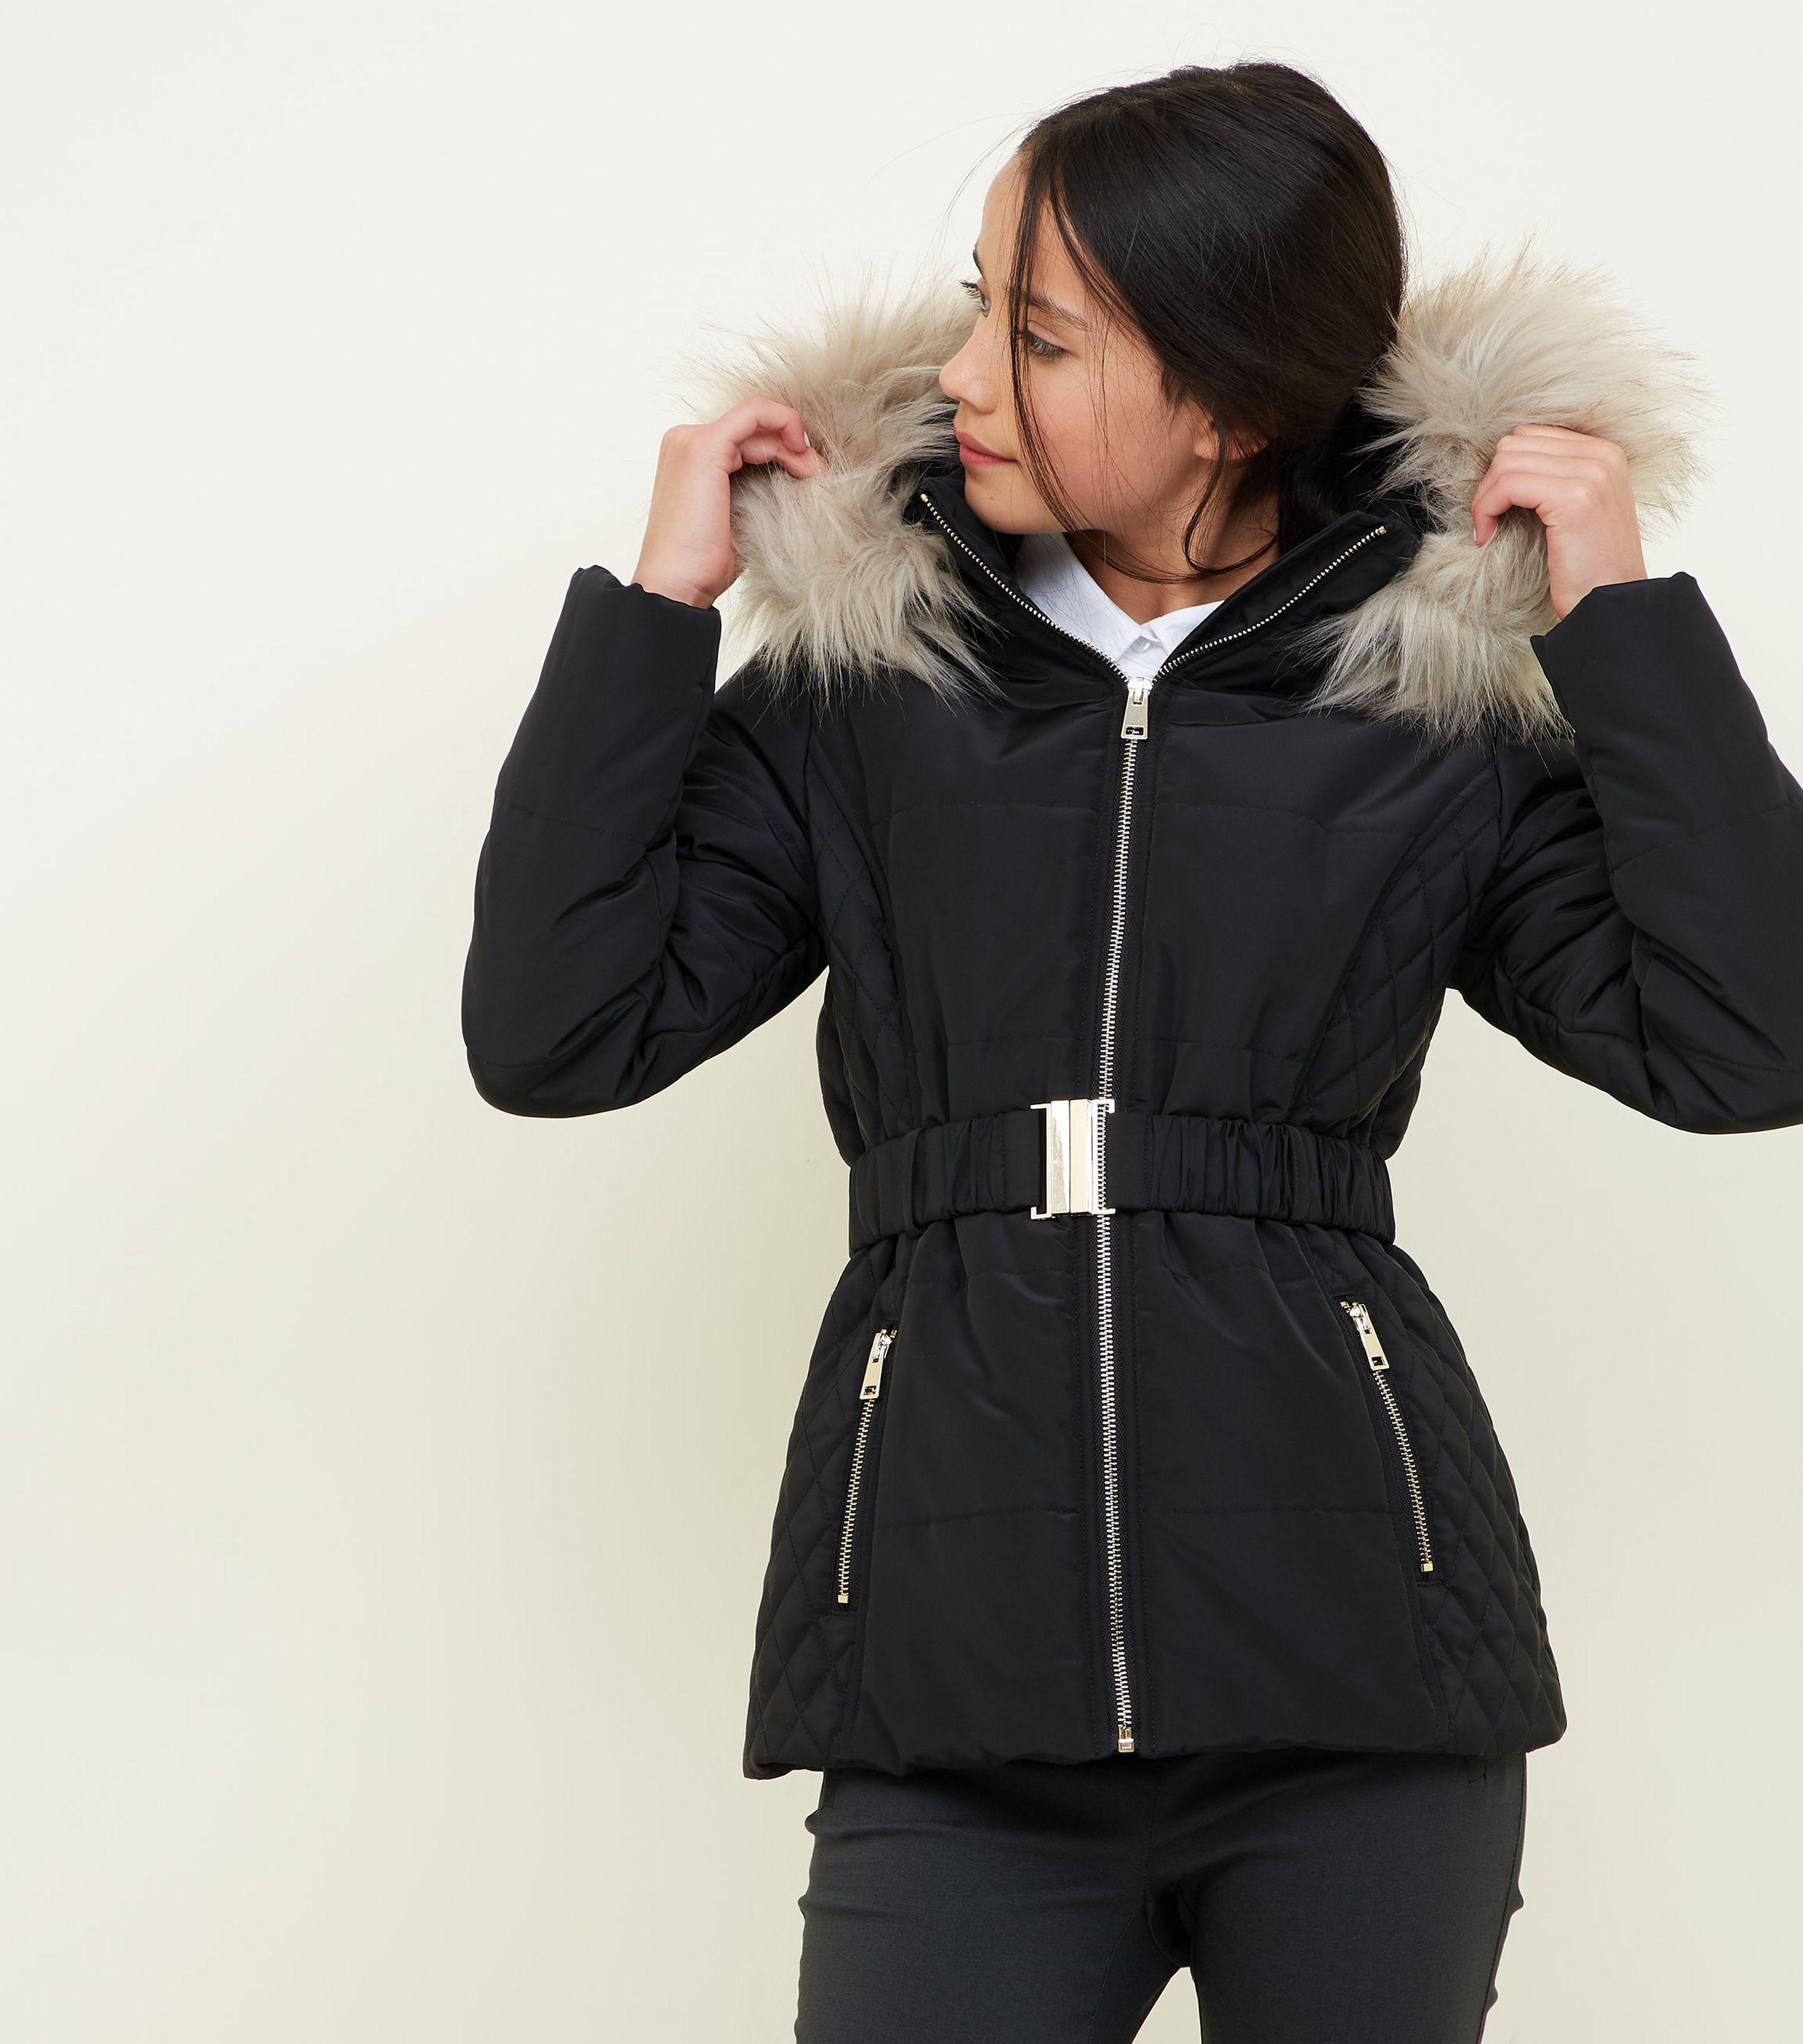 9cc17c624 New Look Girls Black Faux Fur Trim Hood Belted Puffer Jacket in ...